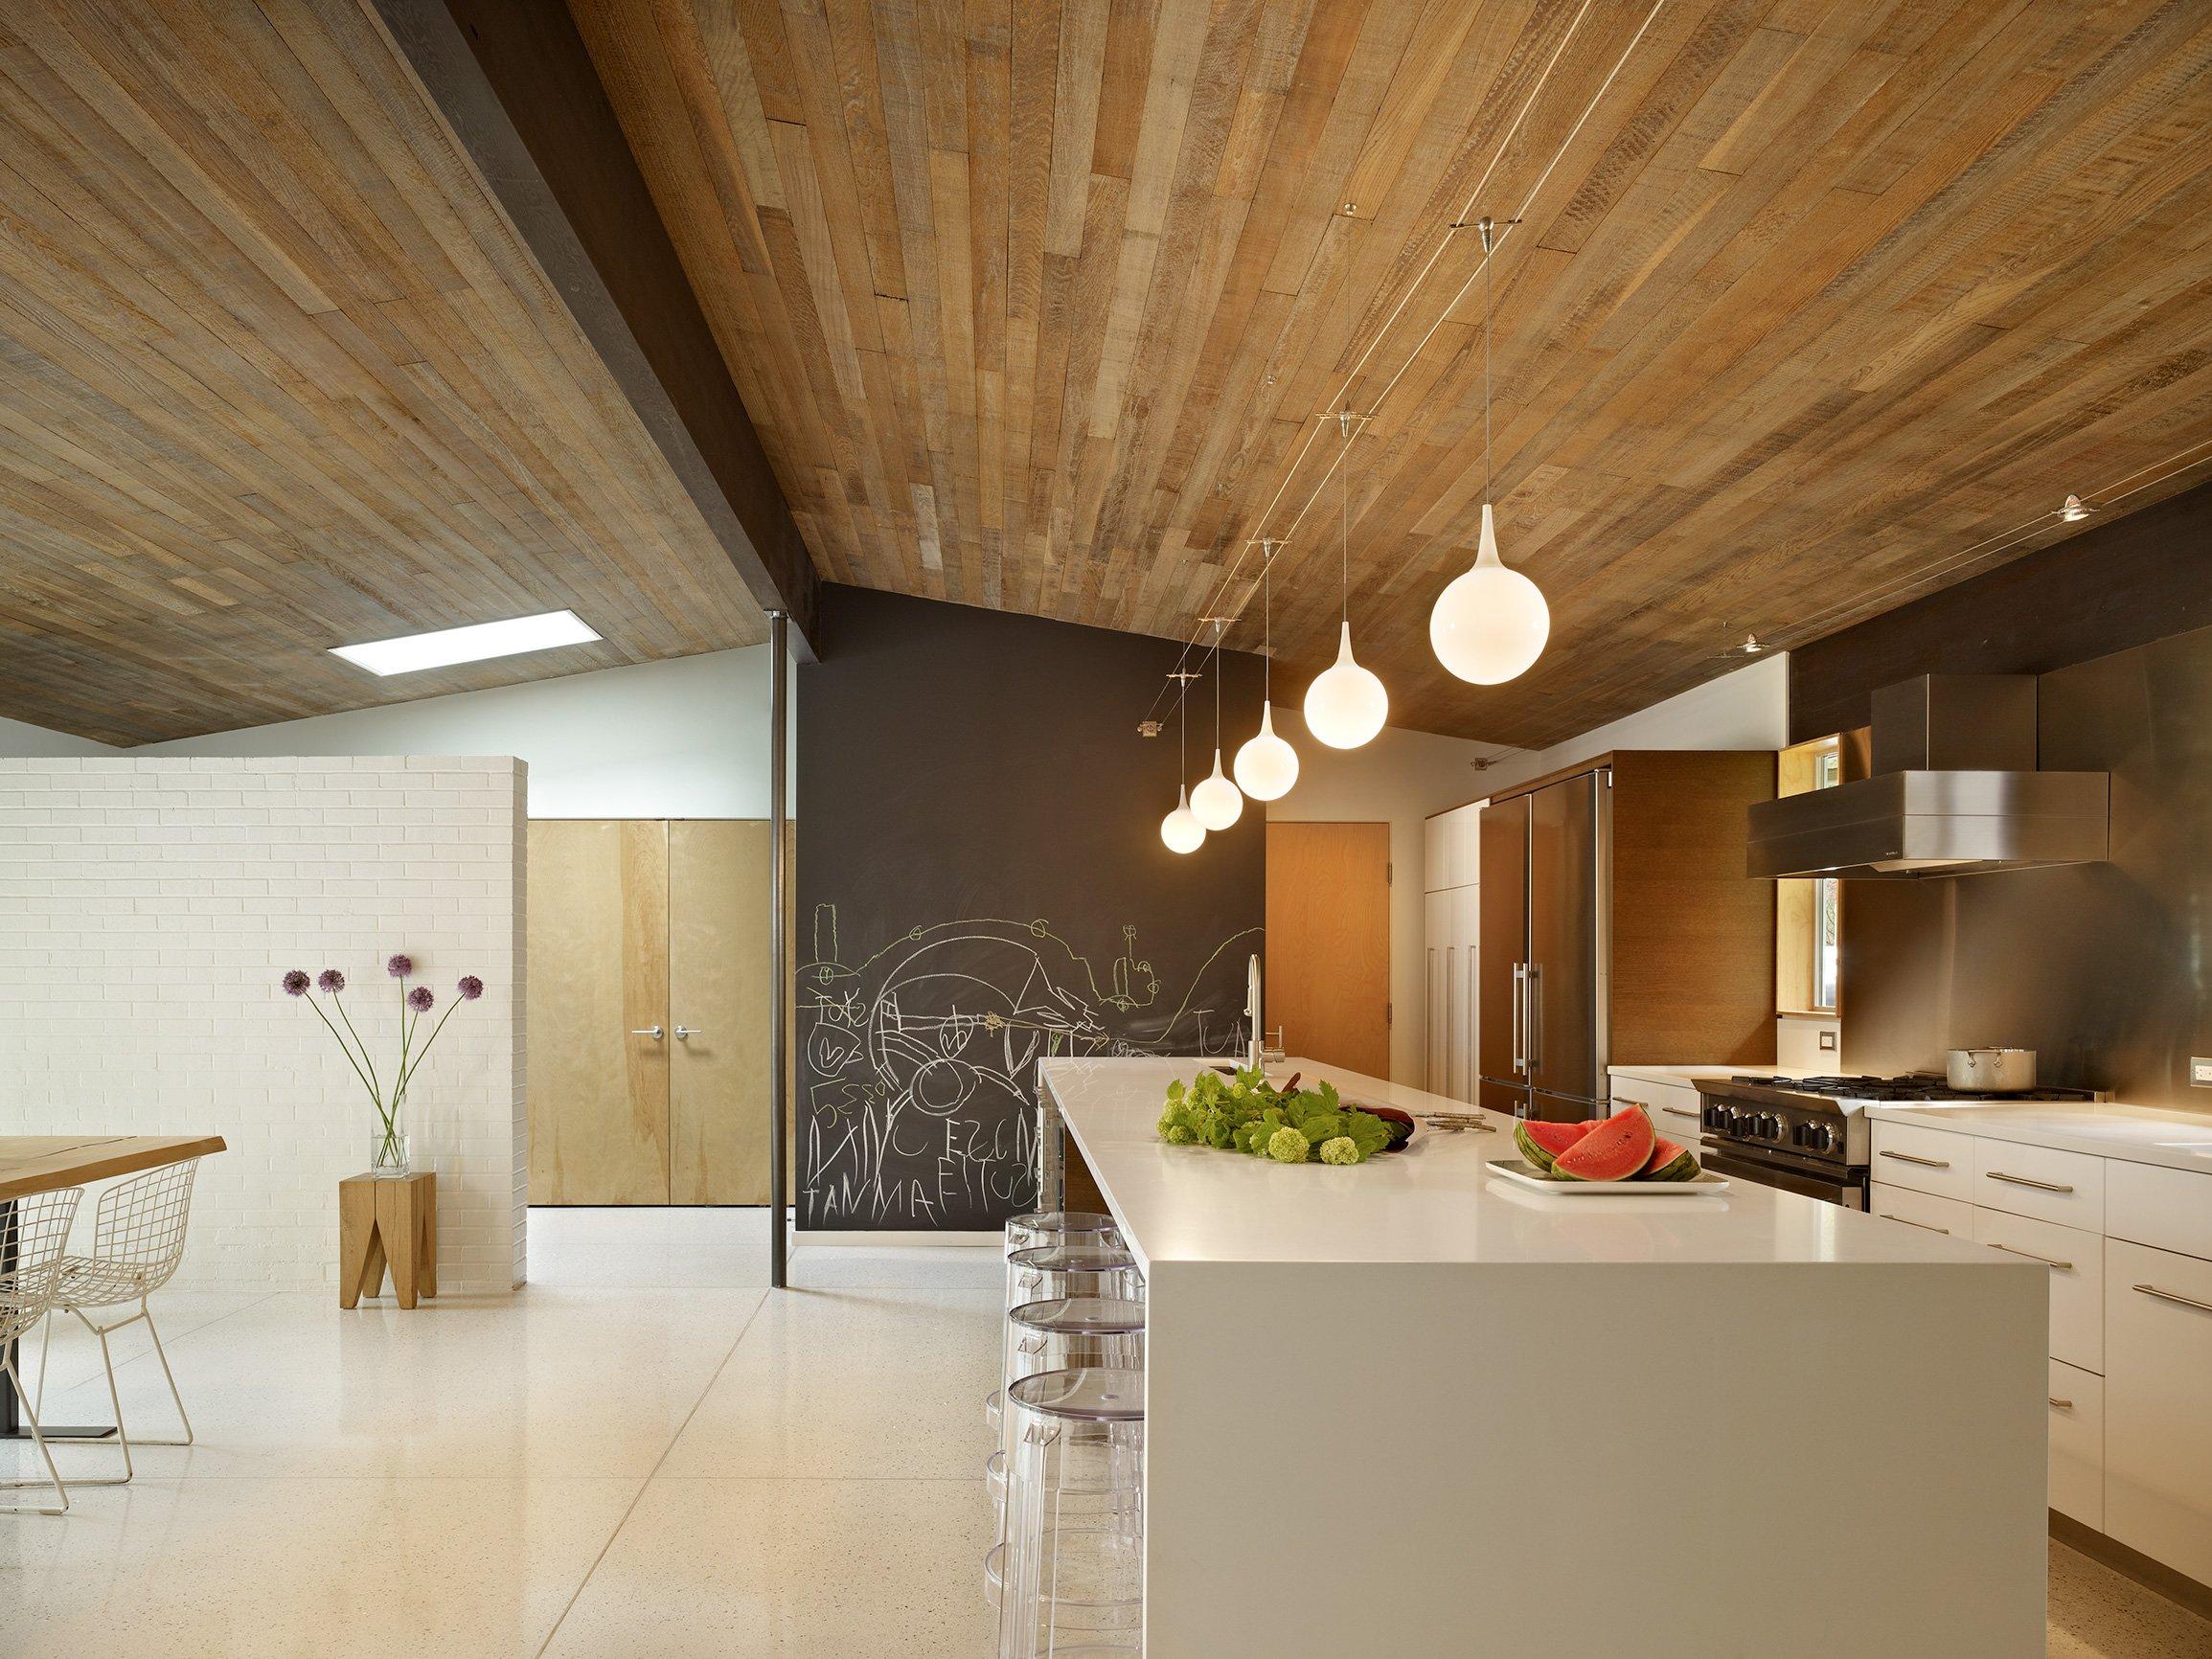 потолок из ламината на кухне фото свой